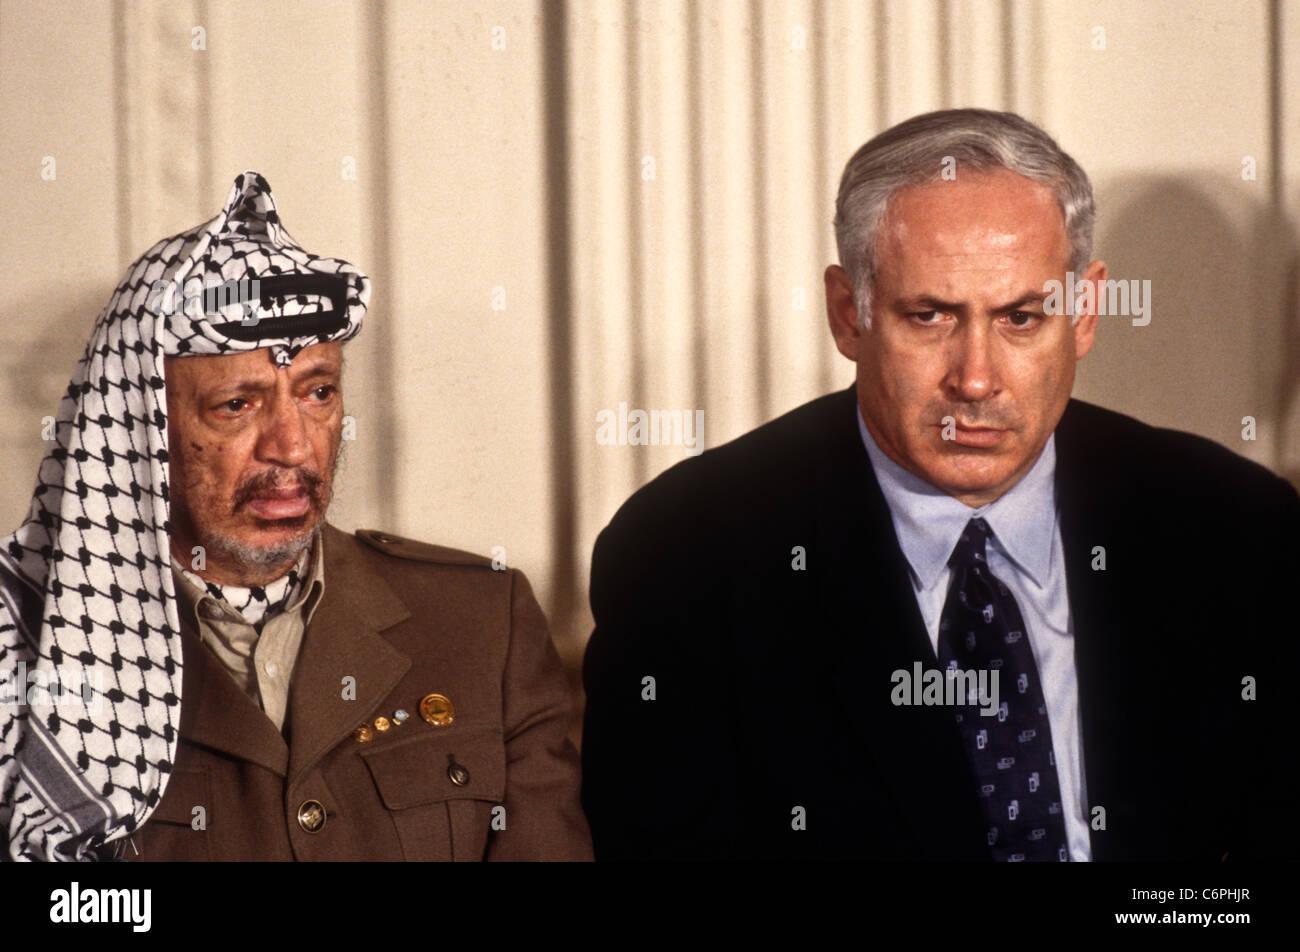 plo leader yasser arafat sits with israeli prime minister benjamin